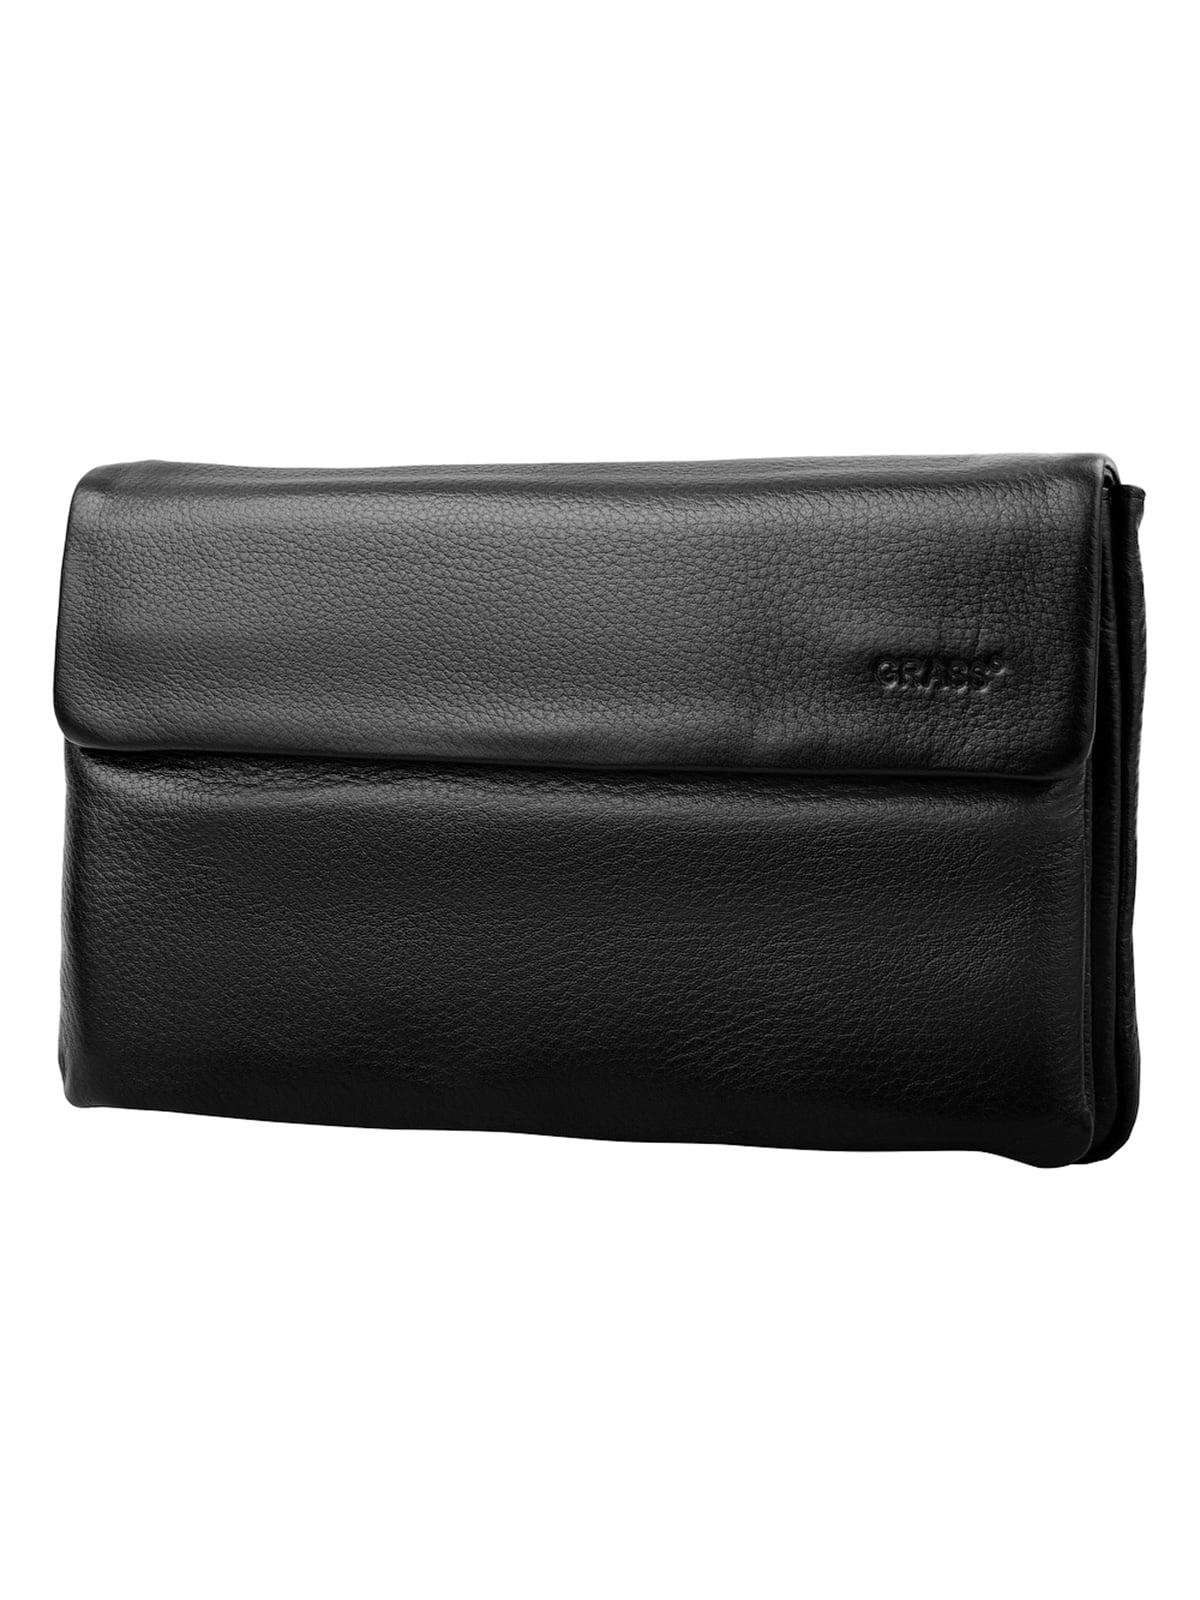 Барсетка-гаманець чорна   5179185